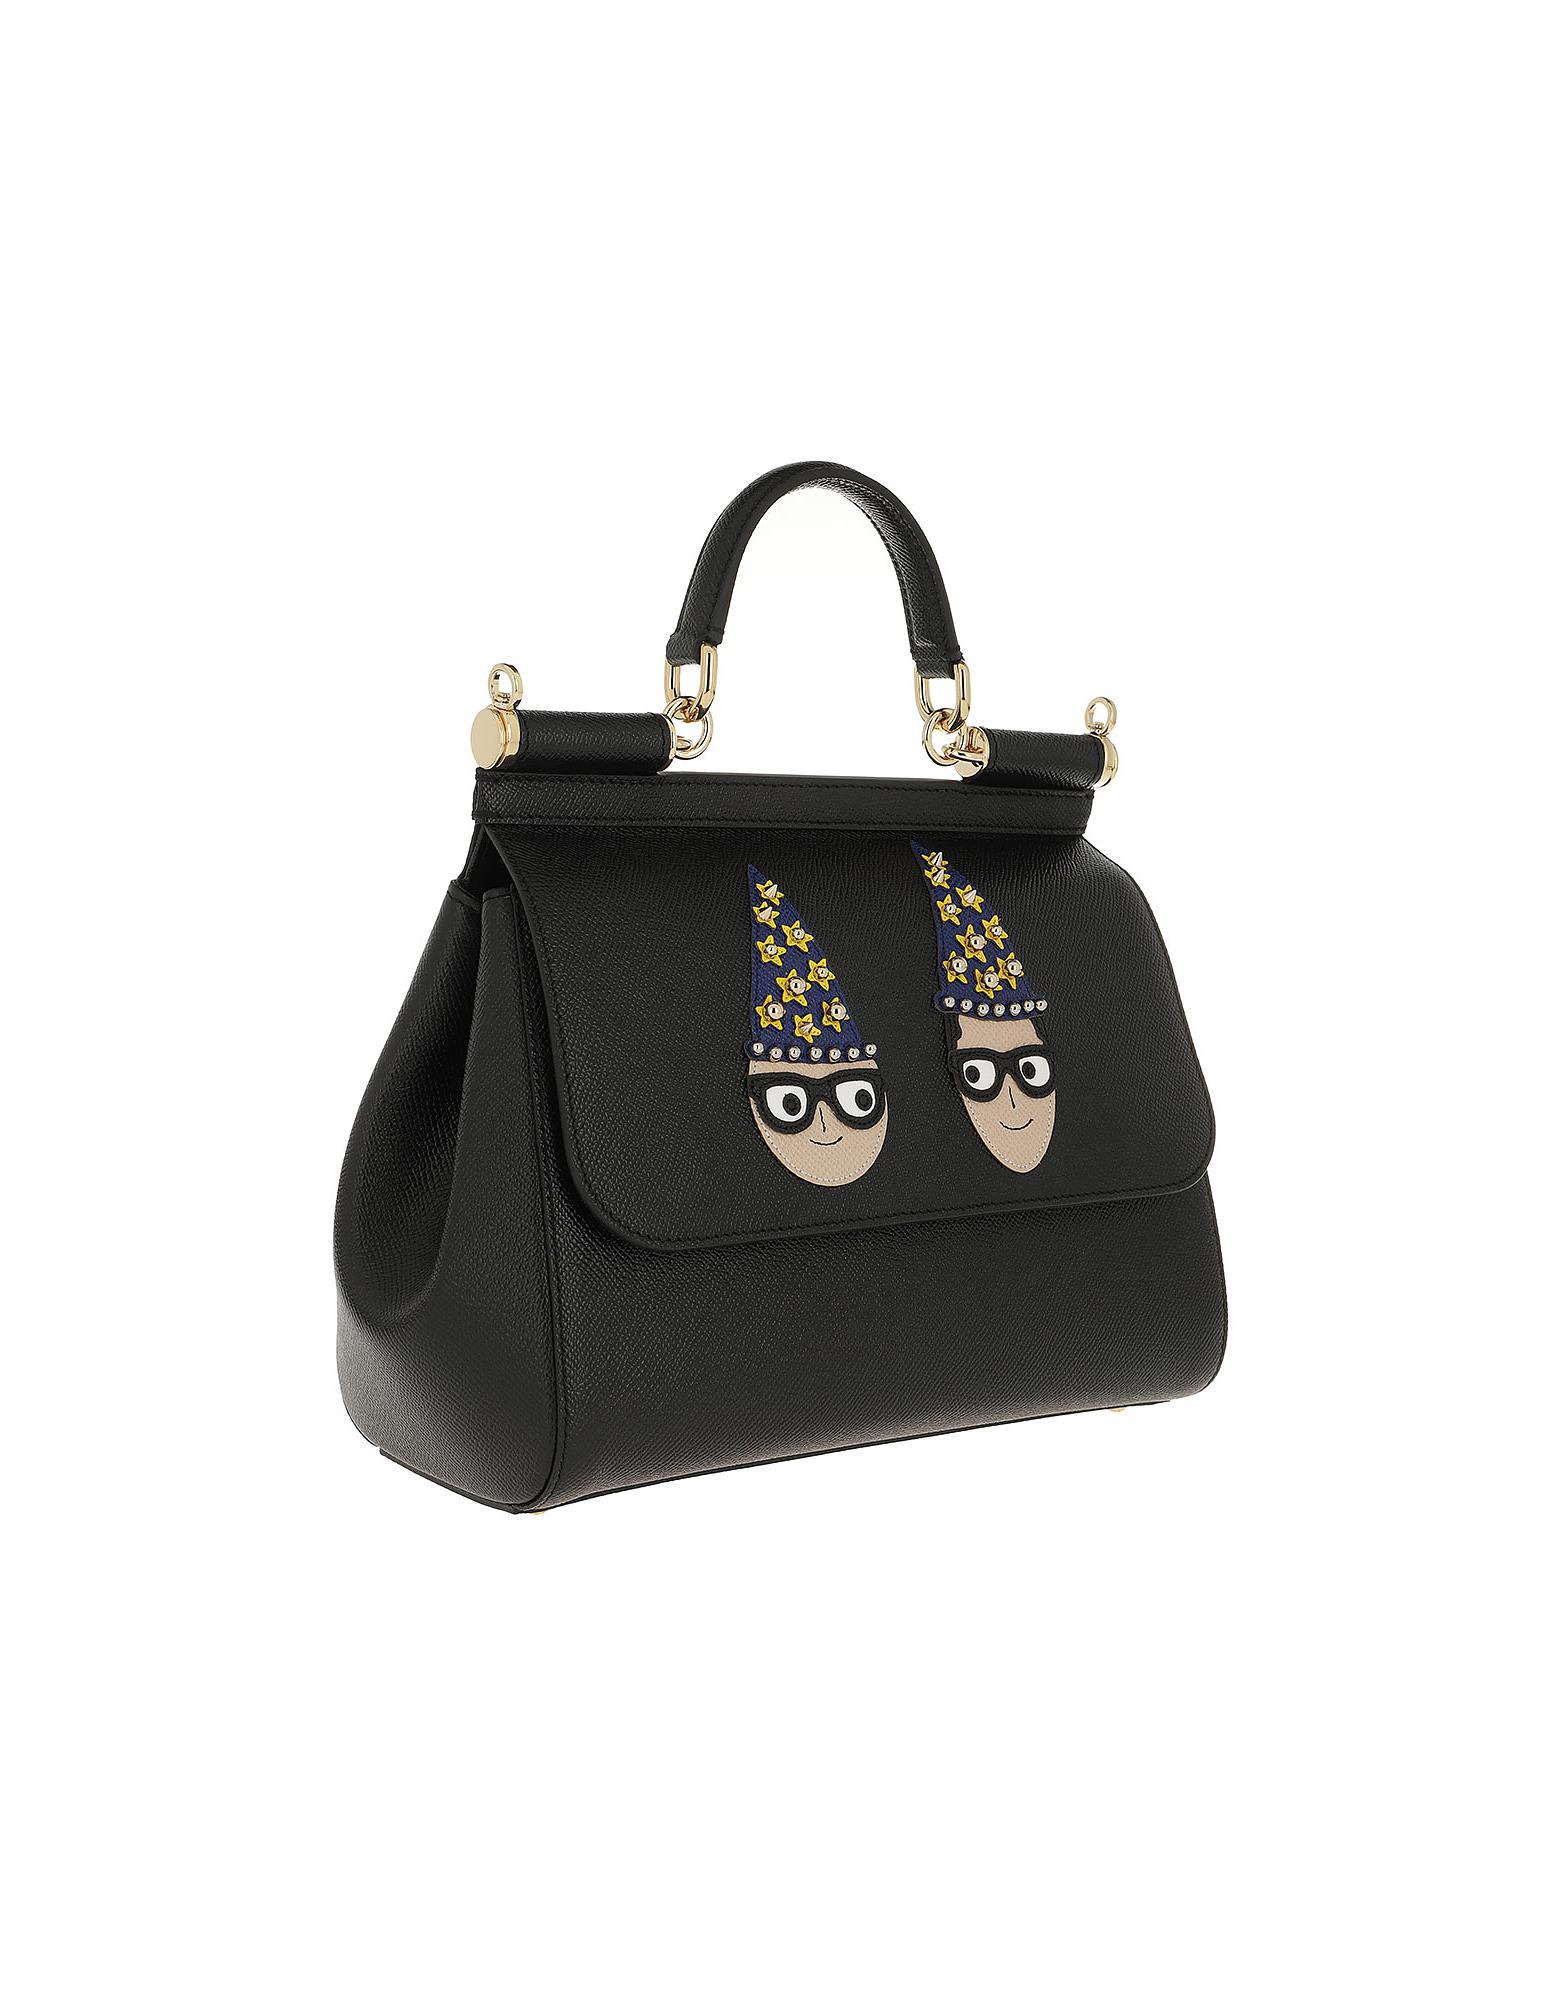 Dolce   Gabbana Sicily Medium Tote Leather Black in Black - Lyst 7485654fcb1fb